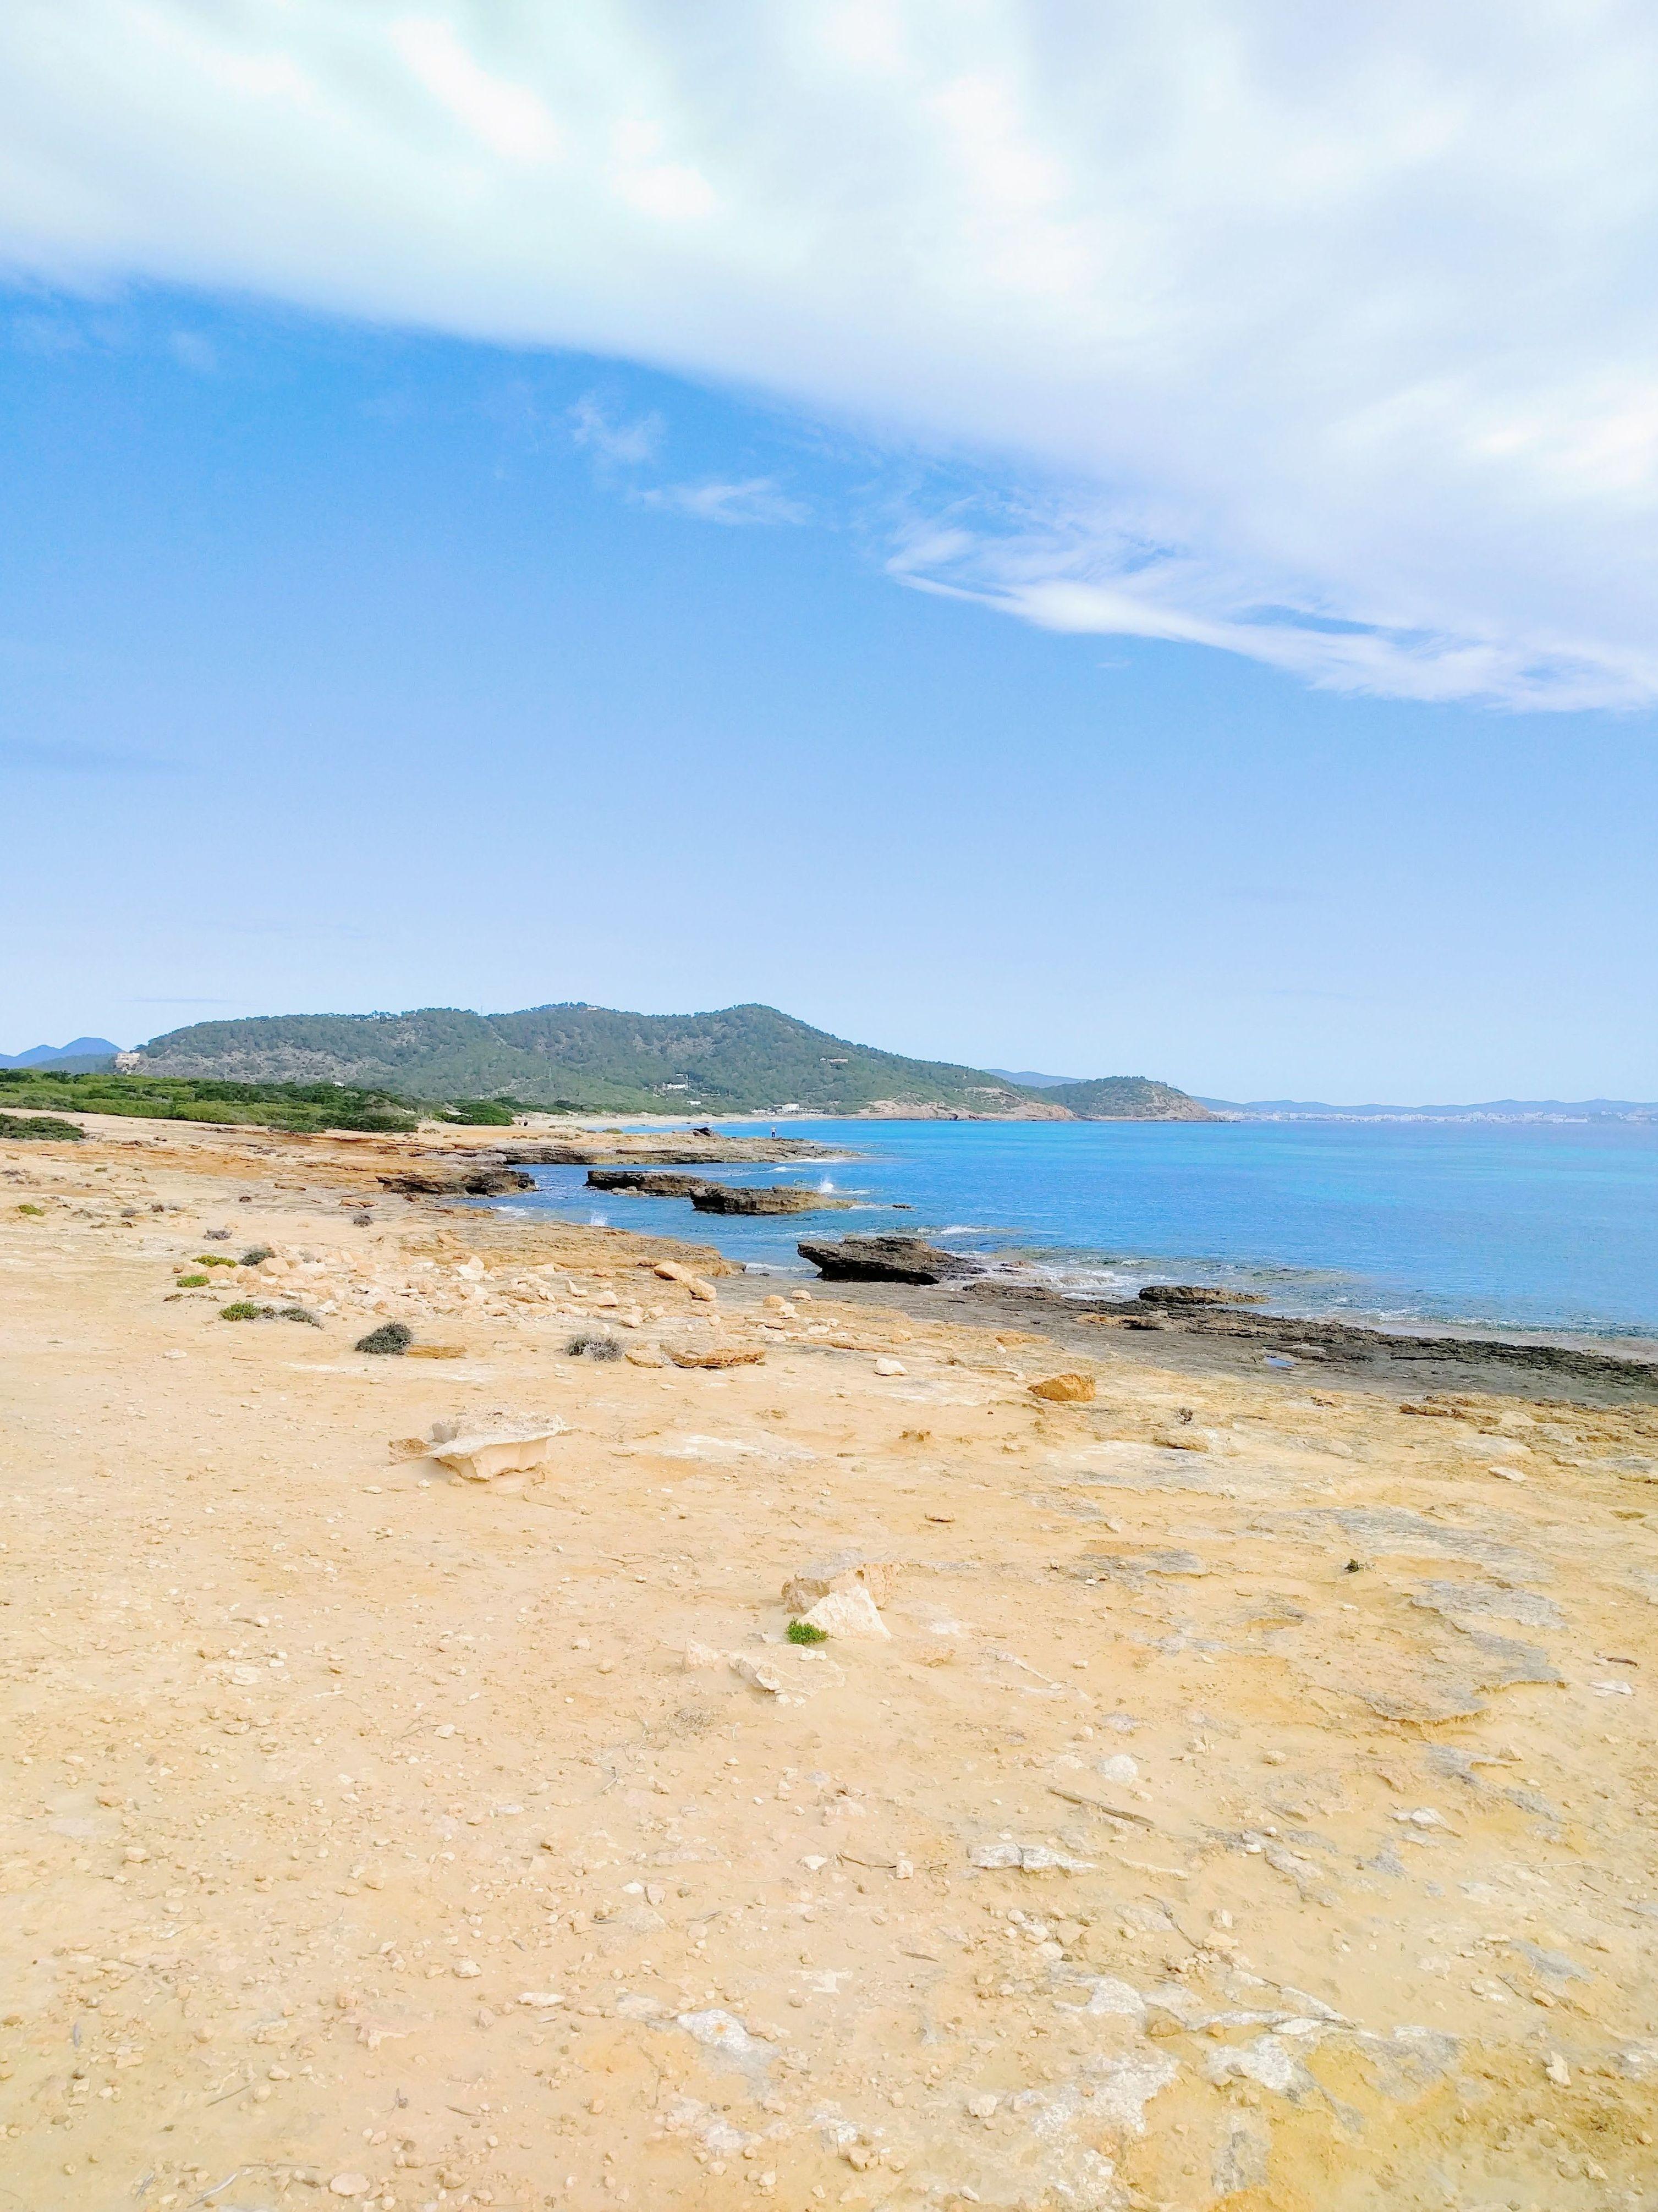 Foto 38 de Abogados en Eivissa | Raad Abogados. Tel 691 270 993